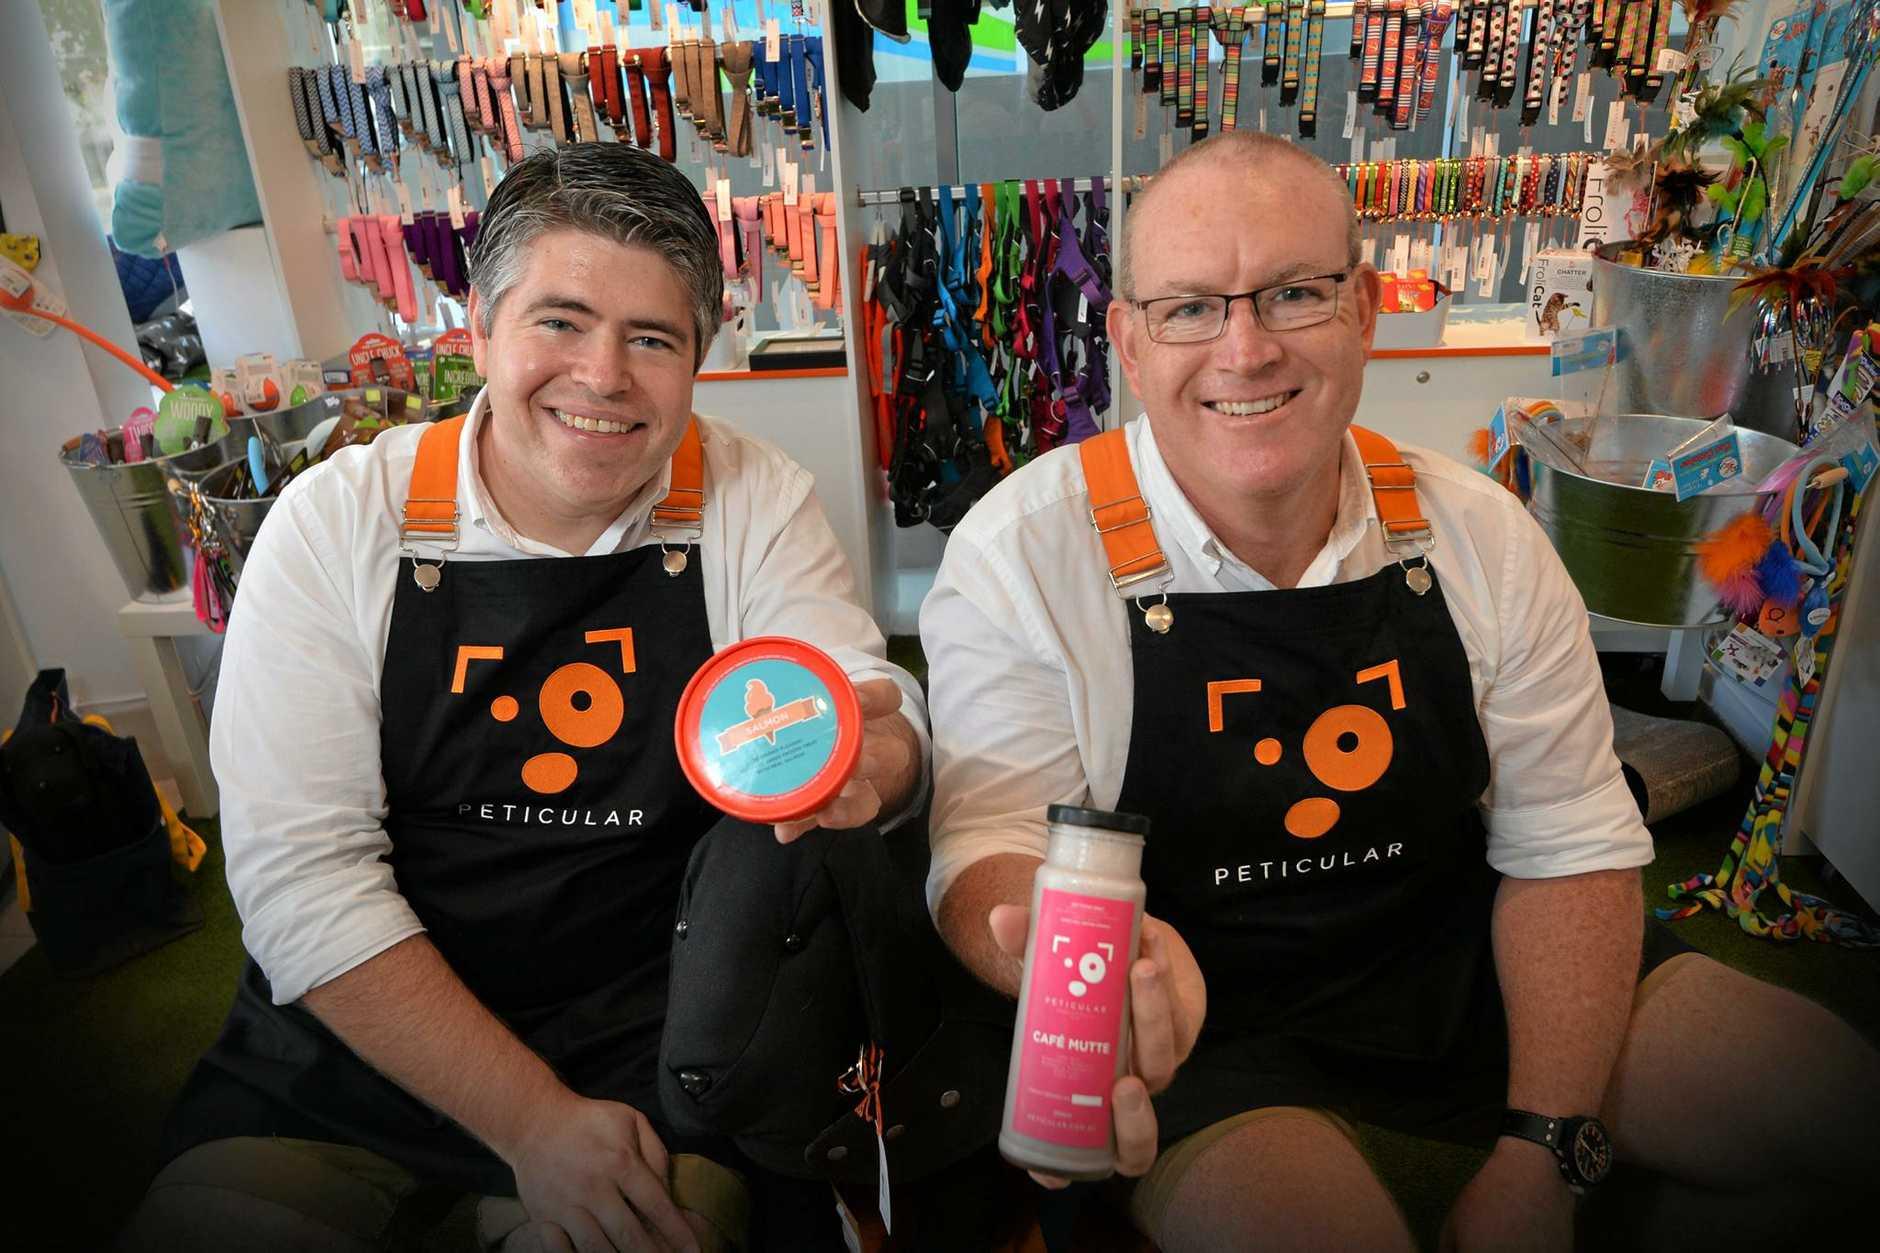 Peticular pet supplies shop owners Jon Manning and Brett Howell.